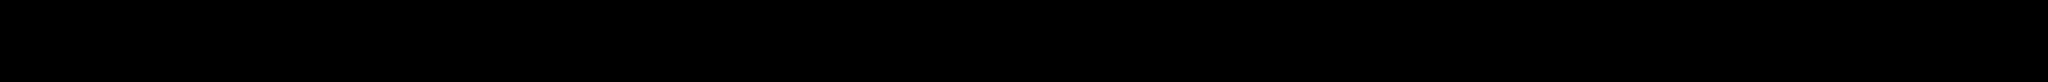 MAHLE ORIGINAL 11427805978, 1109AY, 1109T3, 1109Y2, 1109Z5 маслен филтър